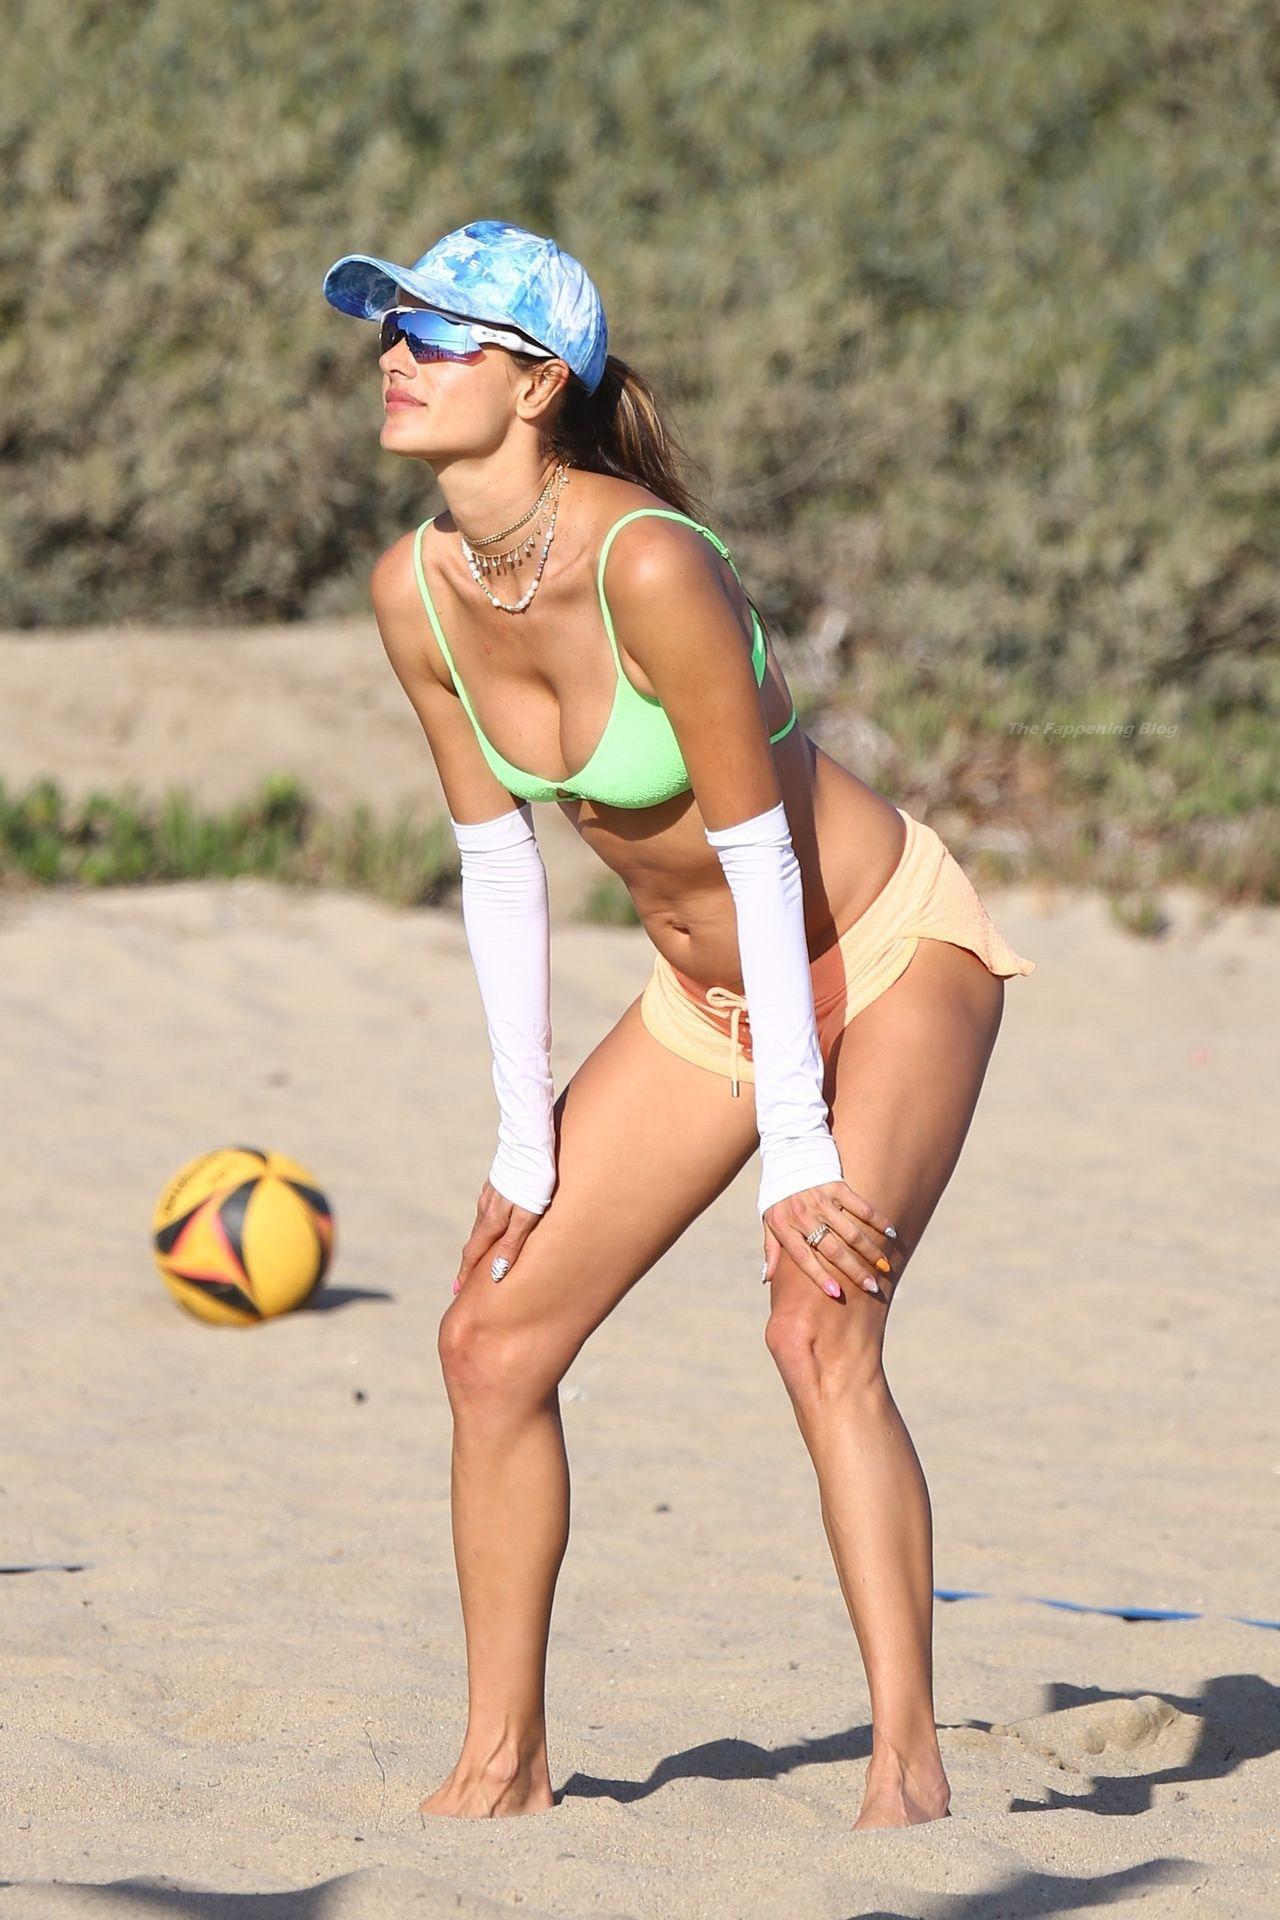 Alessandra-Ambrosio-Sexy-The-Fappening-Blog-1061.jpg